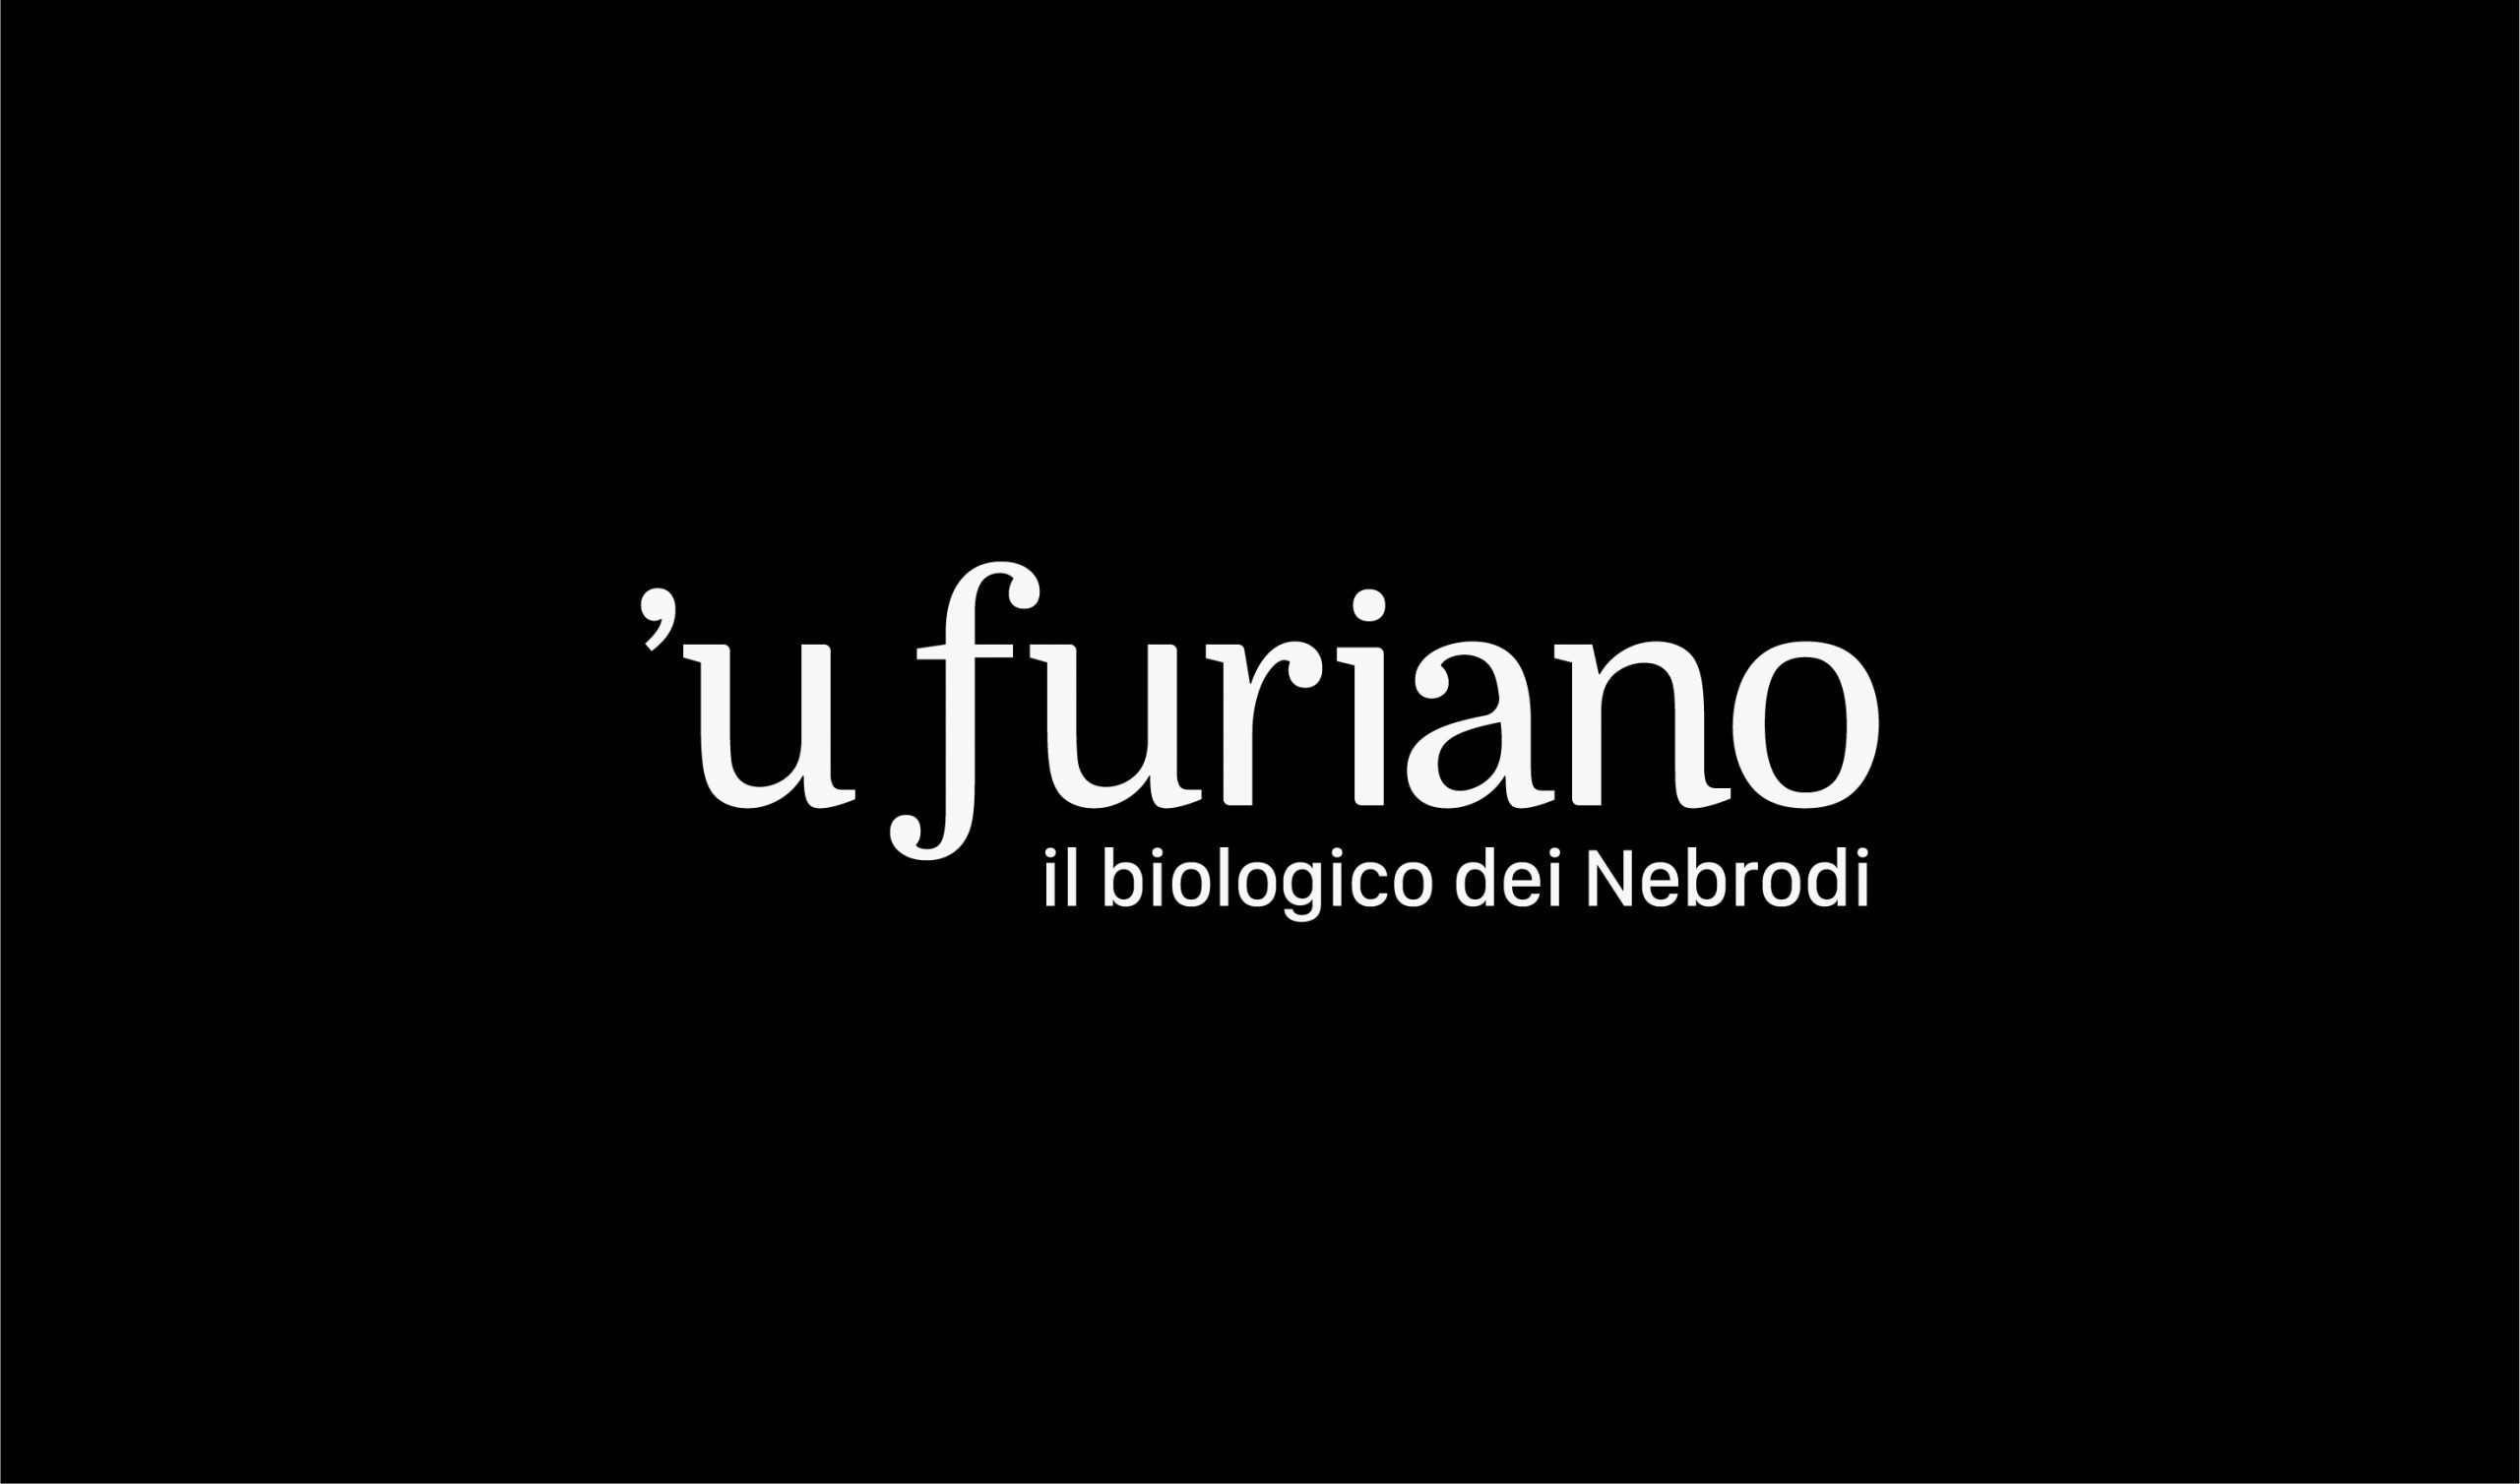 Olio 'u Furiano Packaging e identità visiva - Logo Bianco